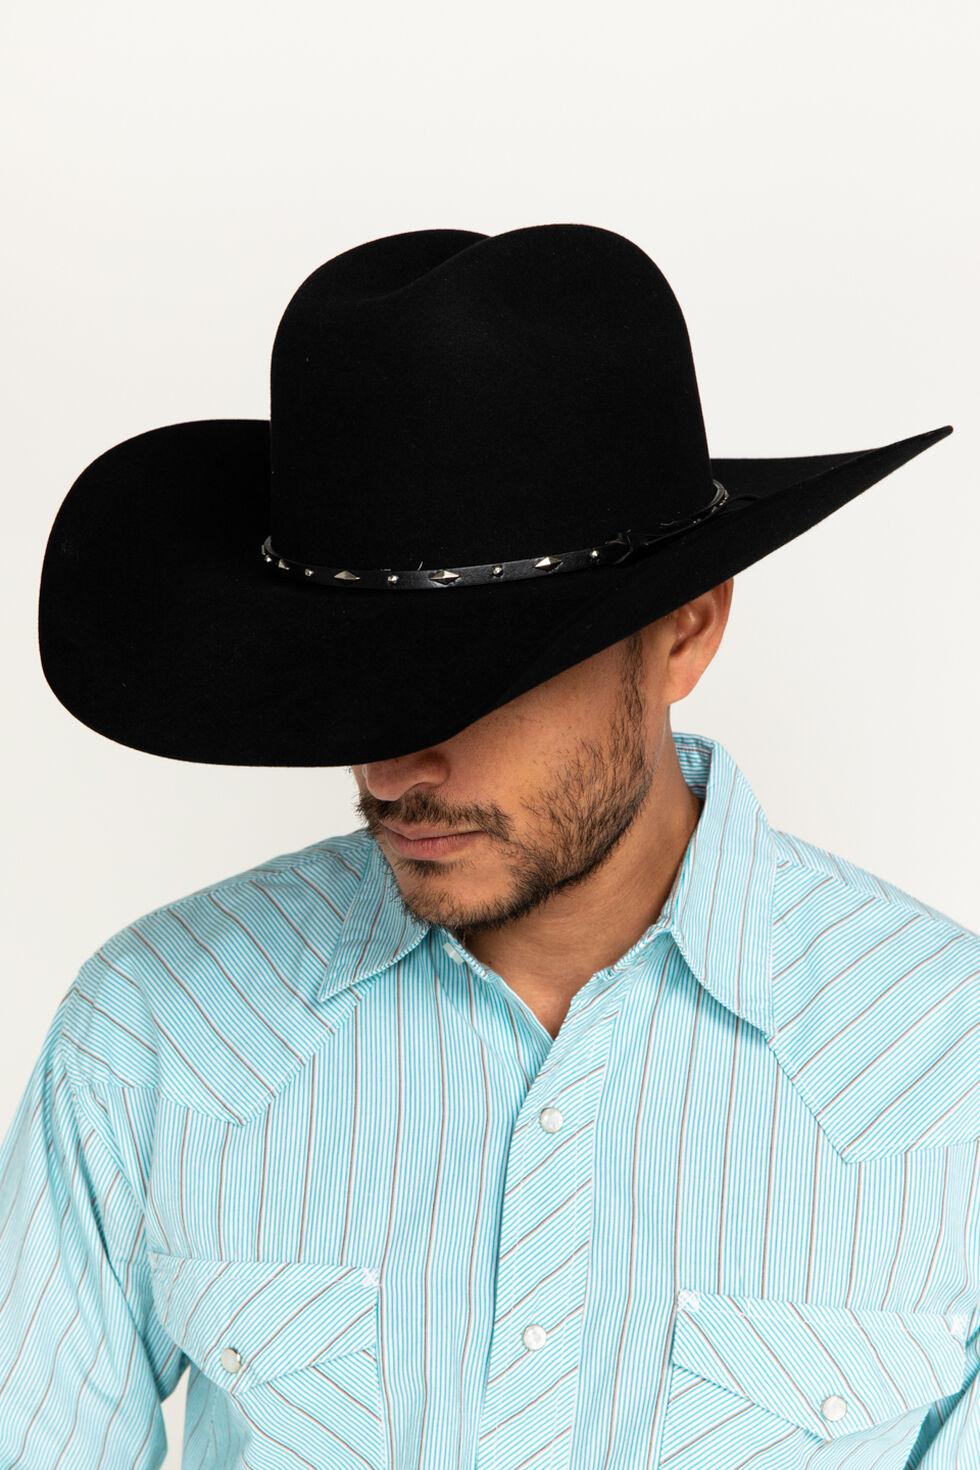 Cody James Colorado 3X Tycoon Wool Felt Cowboy Hat, Black, hi-res